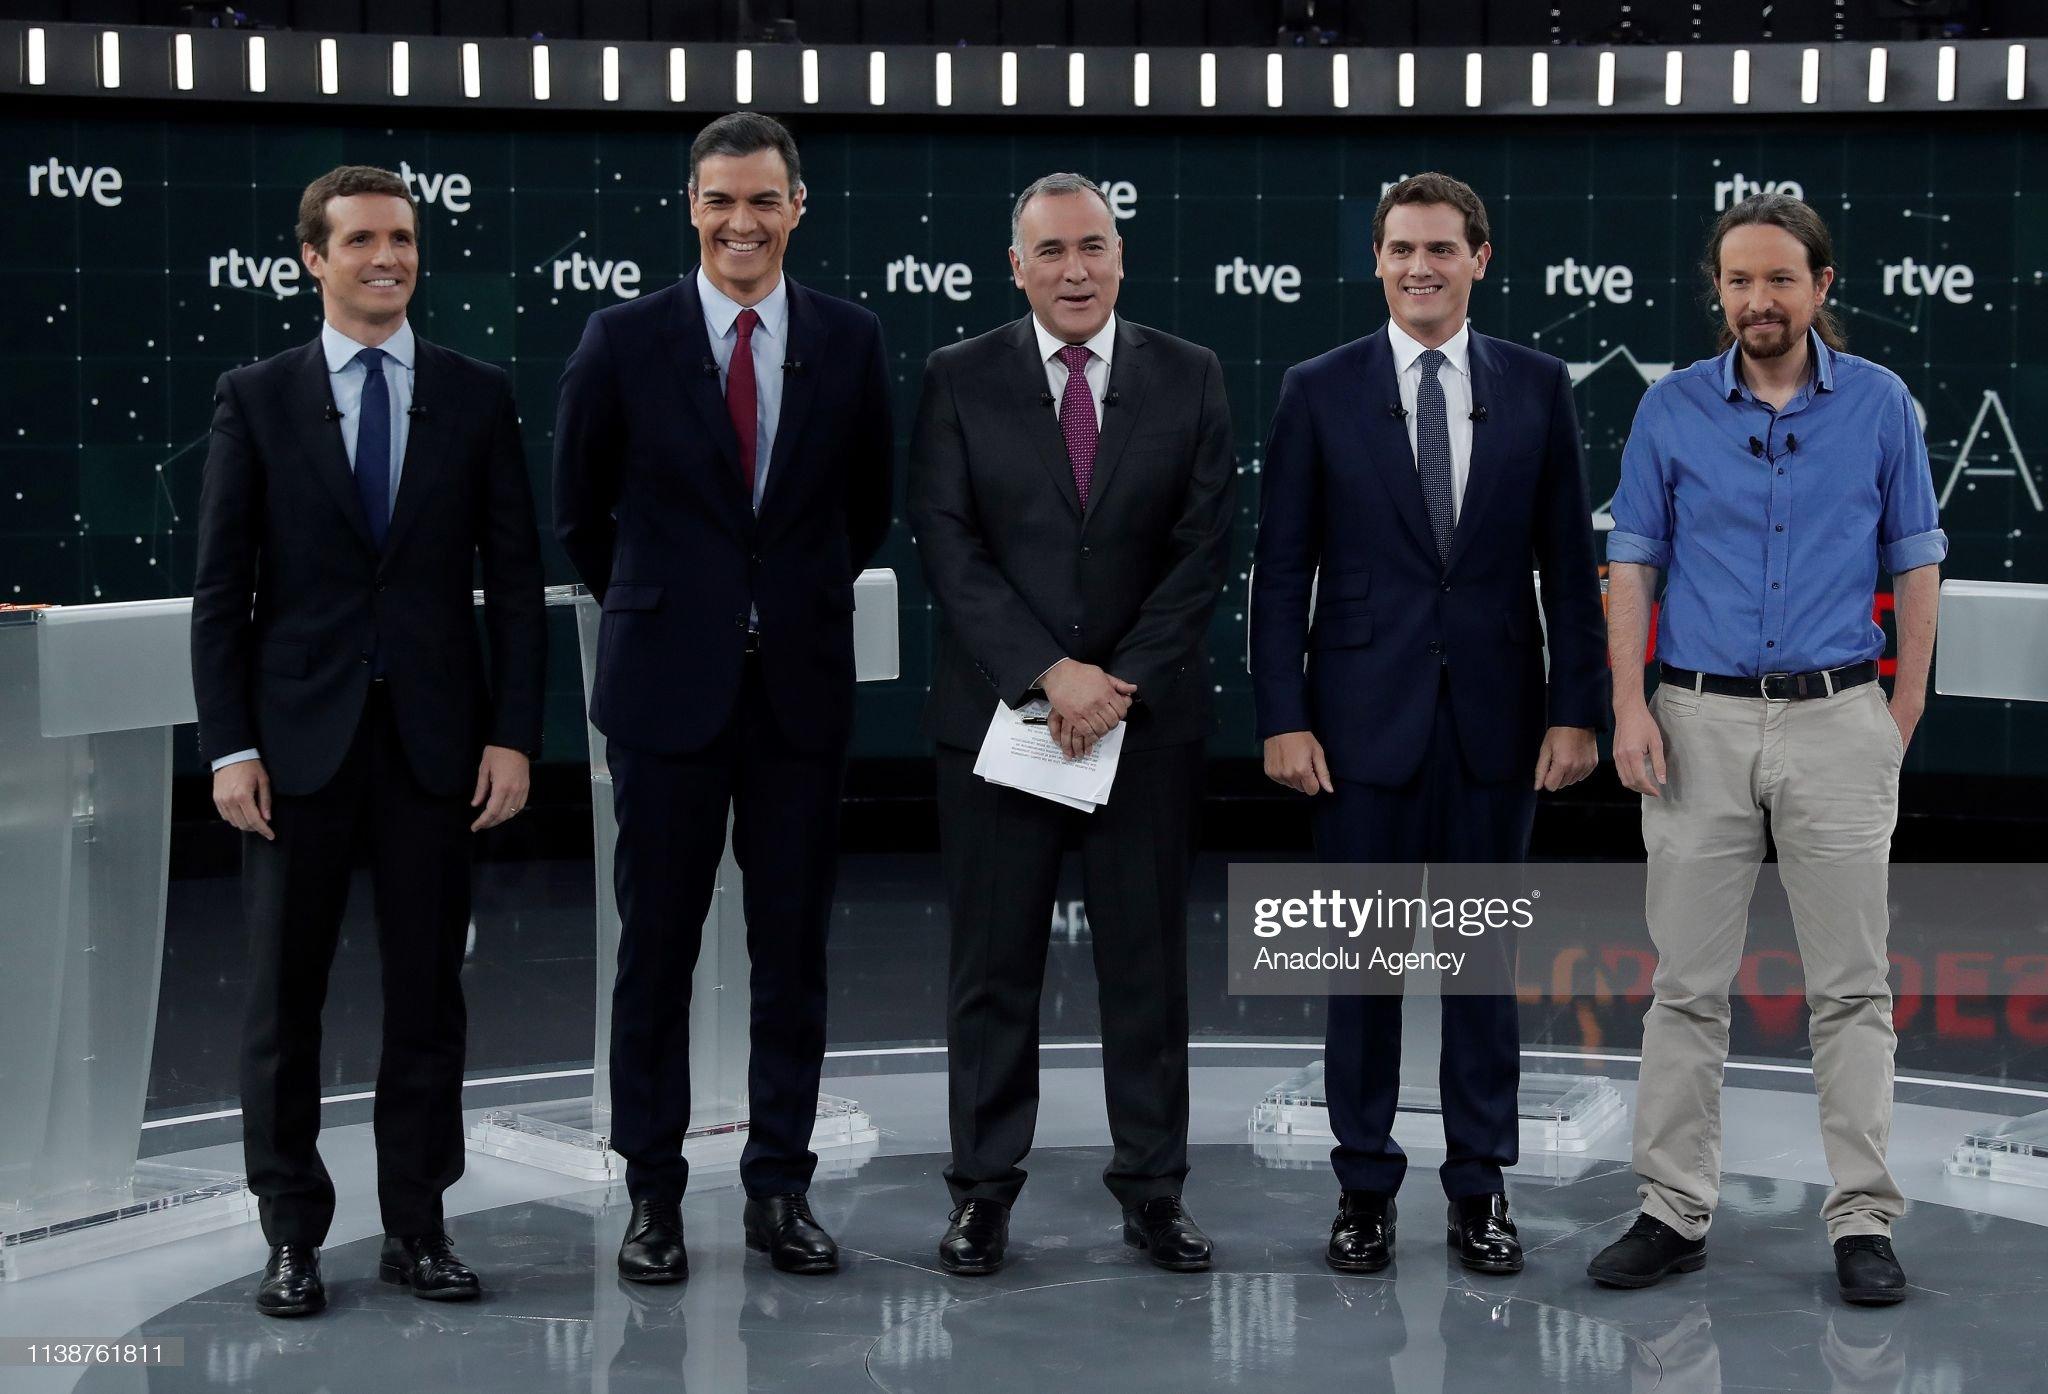 ¿Cuánto mide Pablo Casado?  - Estatura real: 1,77 - Página 7 Prime-minister-candidates-leader-of-podemos-party-pablo-iglesias-of-picture-id1138761811?s=2048x2048